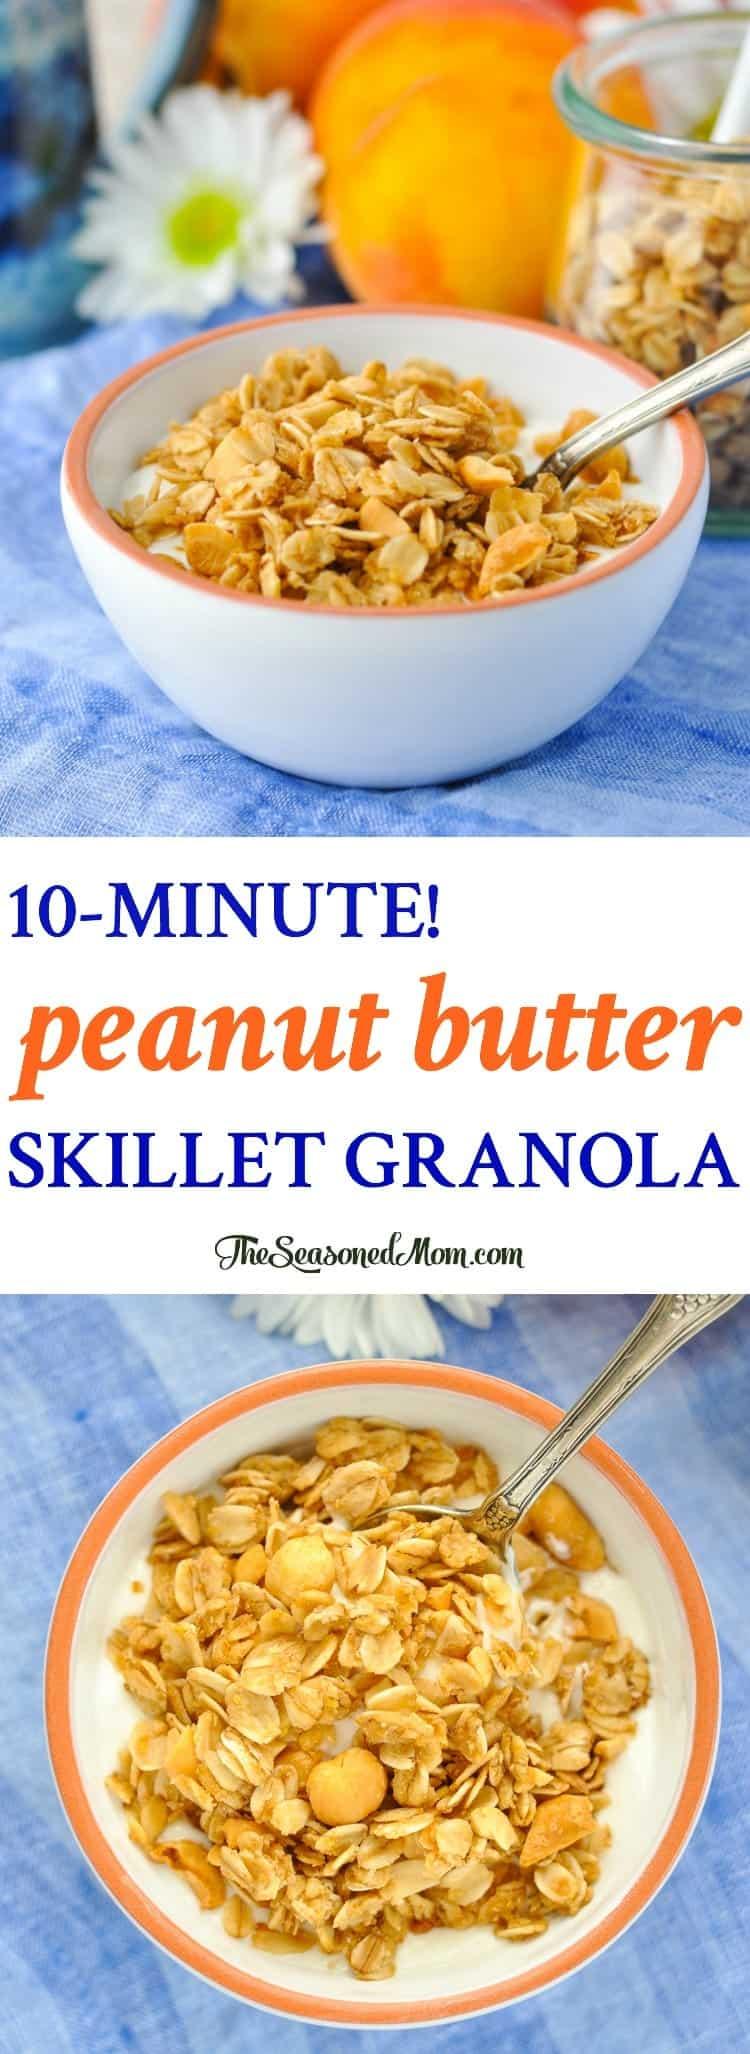 Try this 10-Minute Peanut Butter Skillet Granola for an easy breakfast recipe! Breakfast Ideas   Healthy Breakfast